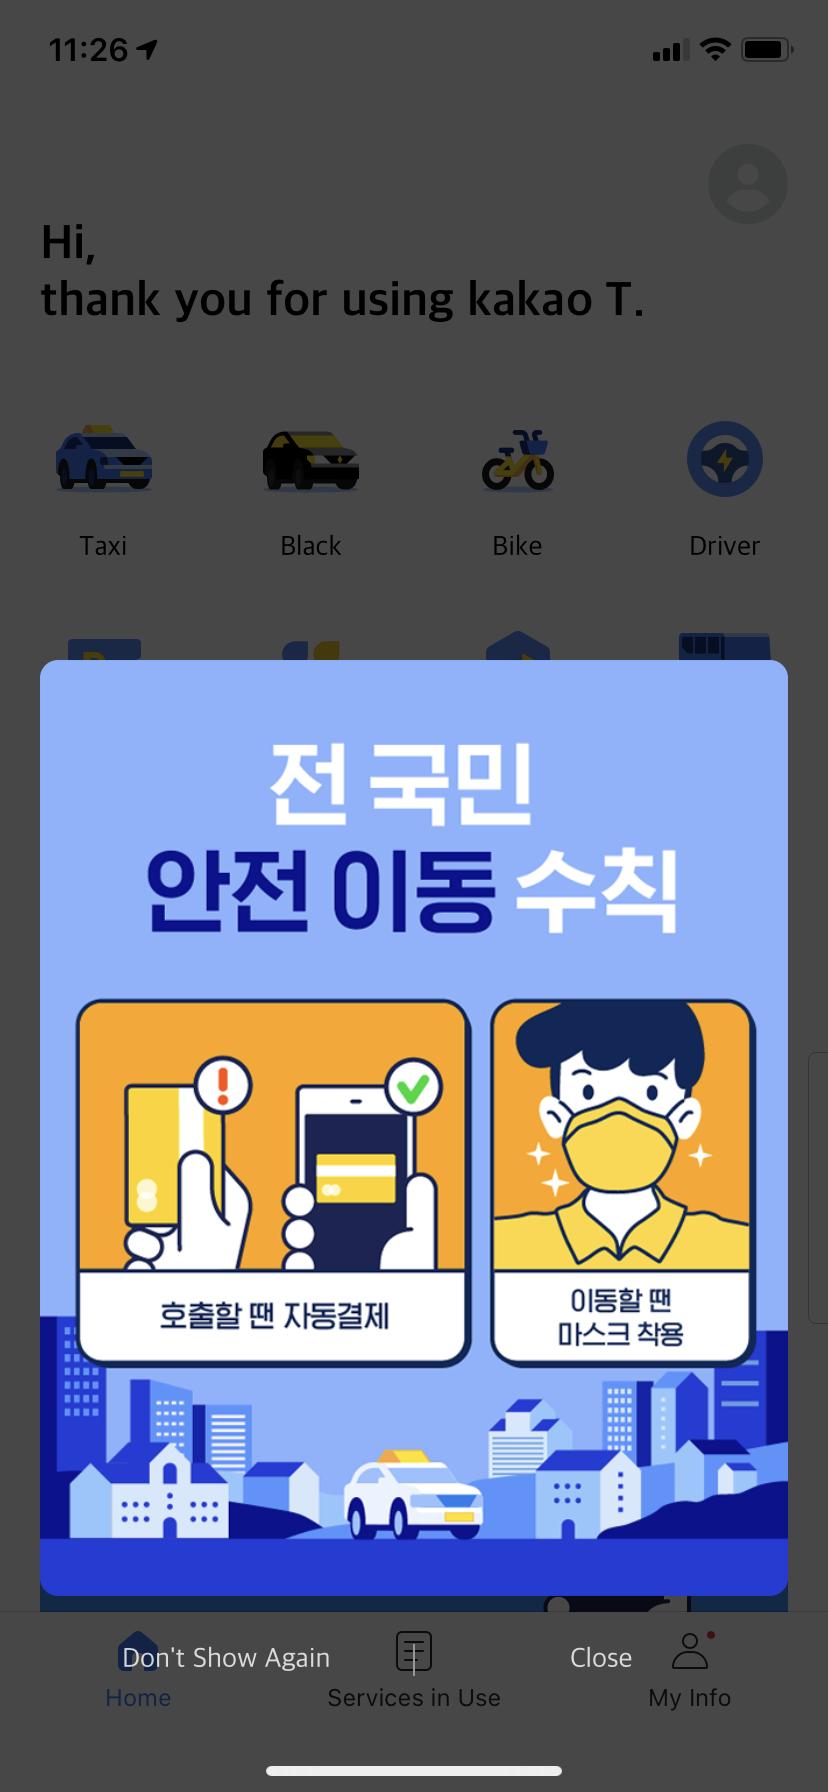 kakao t taxi hailing app coronavirus in-app mob